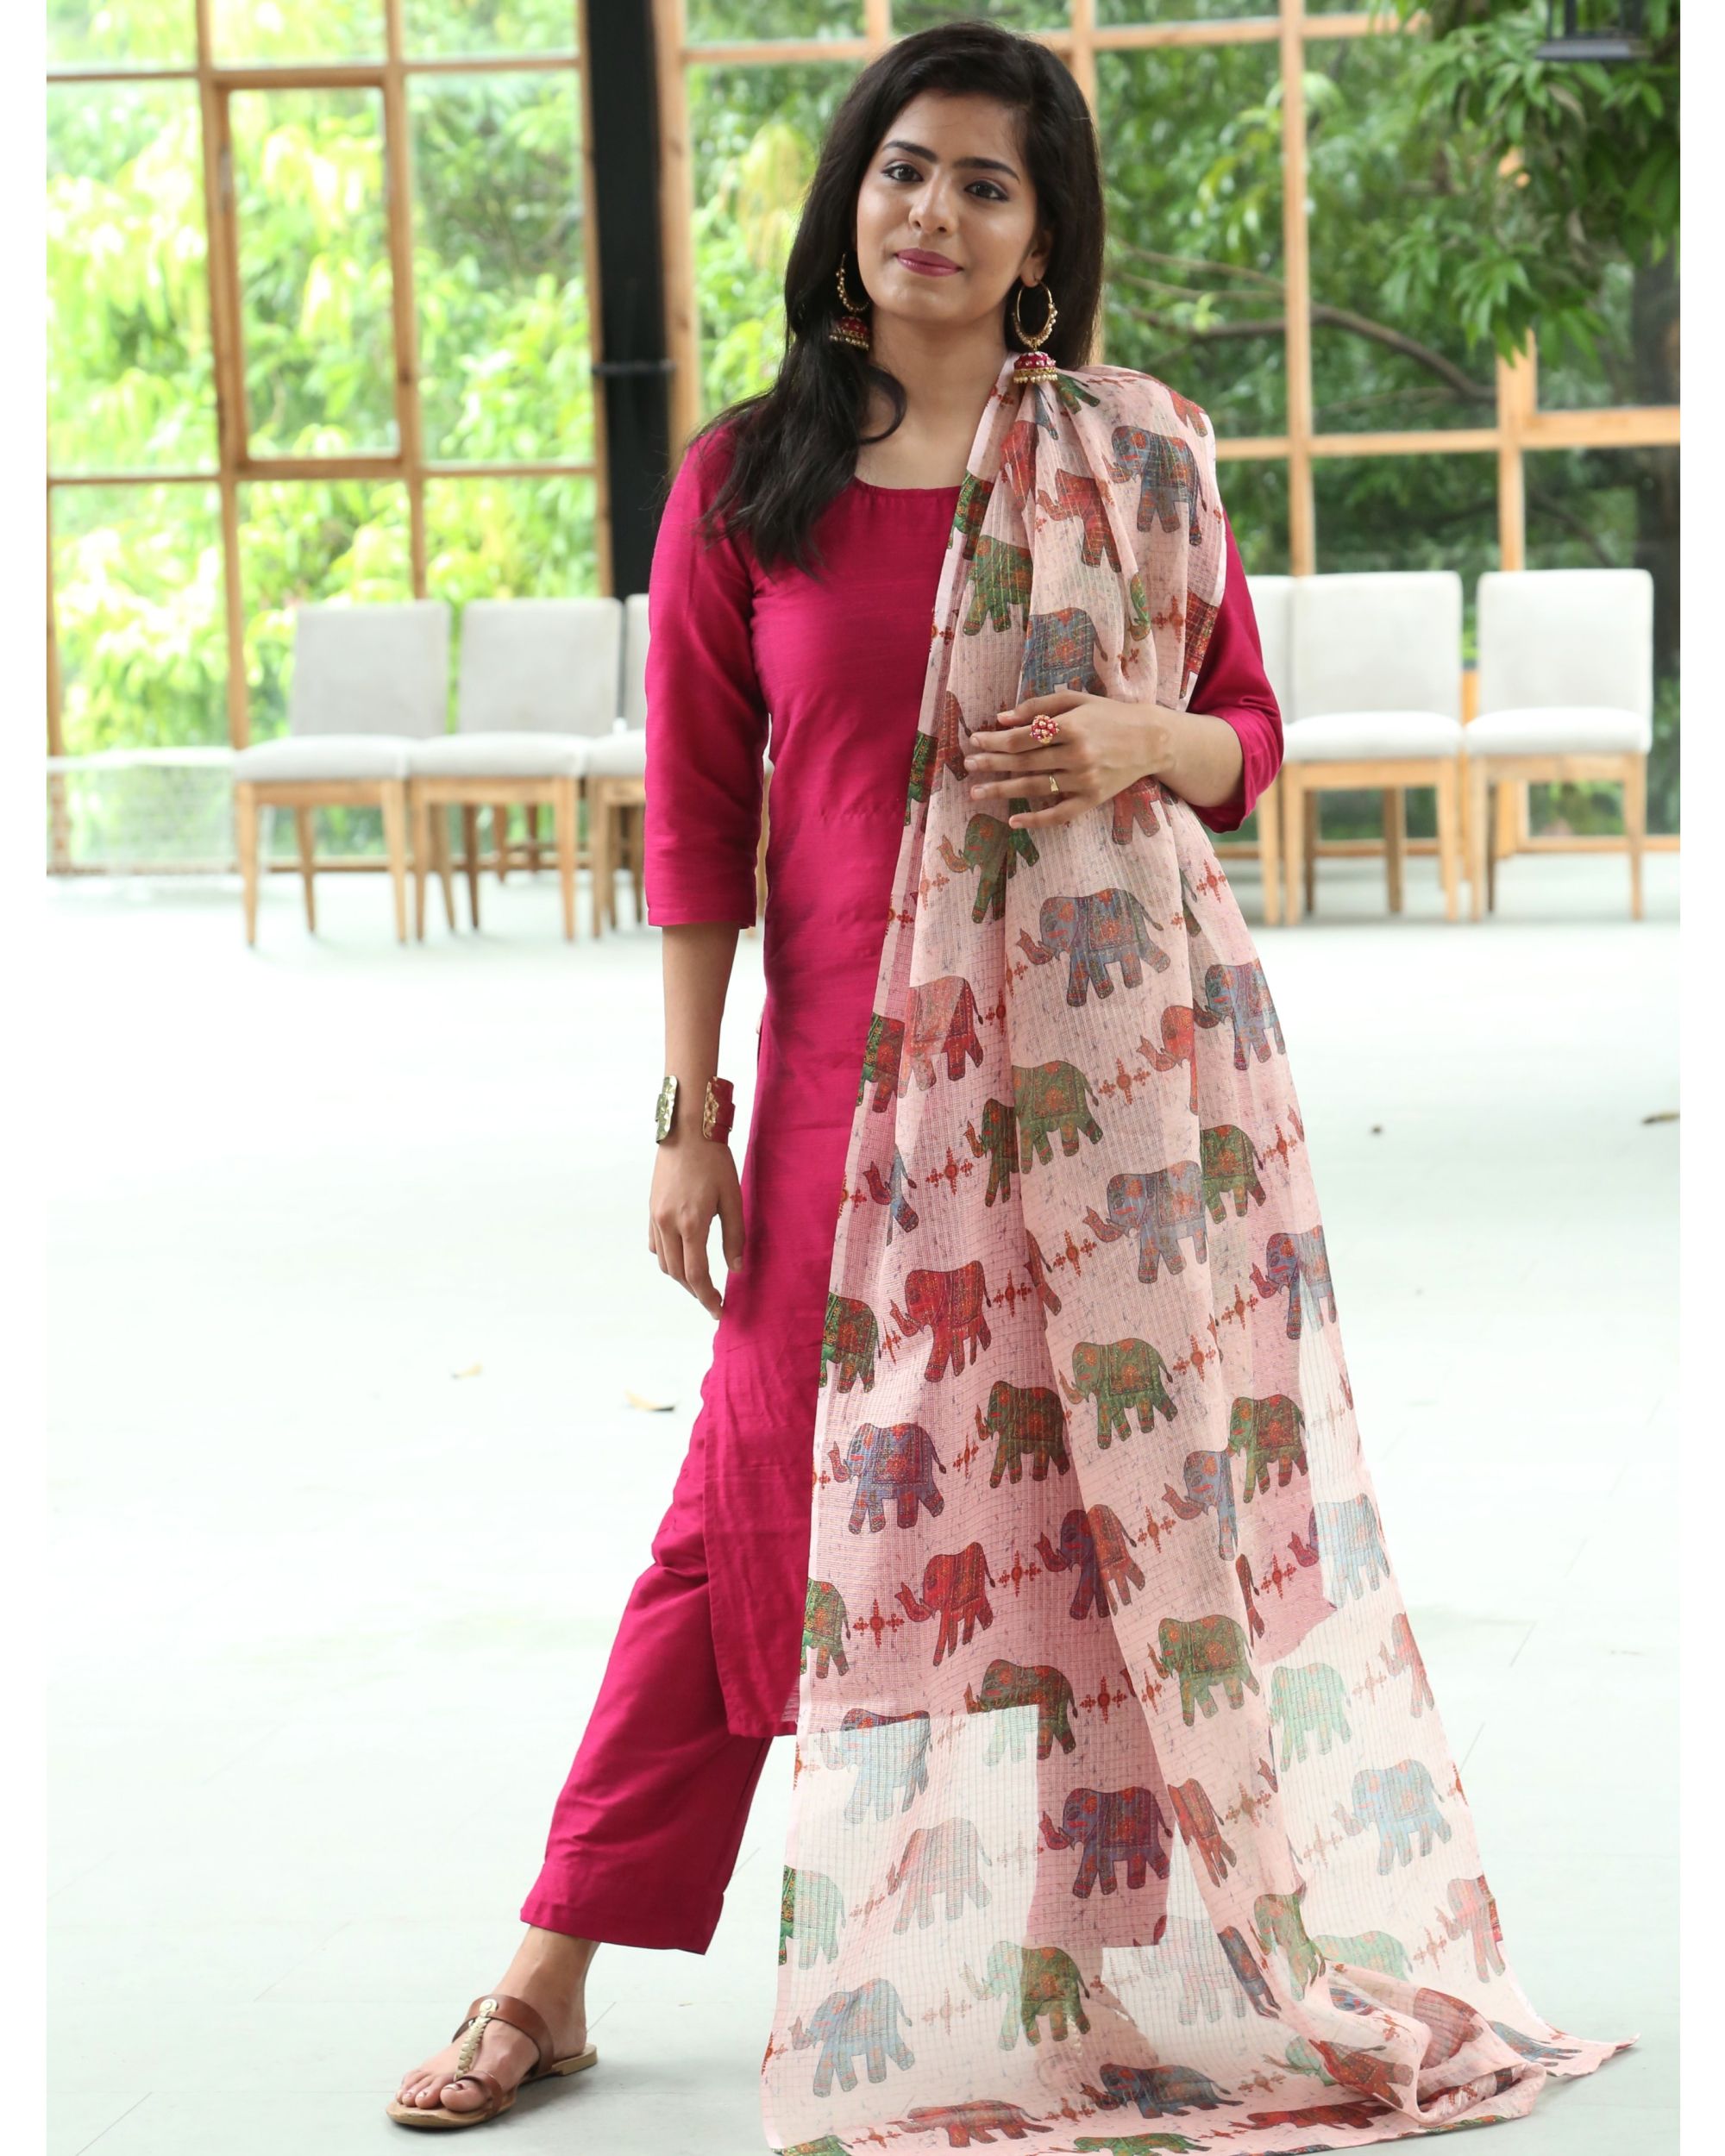 Cherry red kurta and pants with elephant printed dupatta - set of three